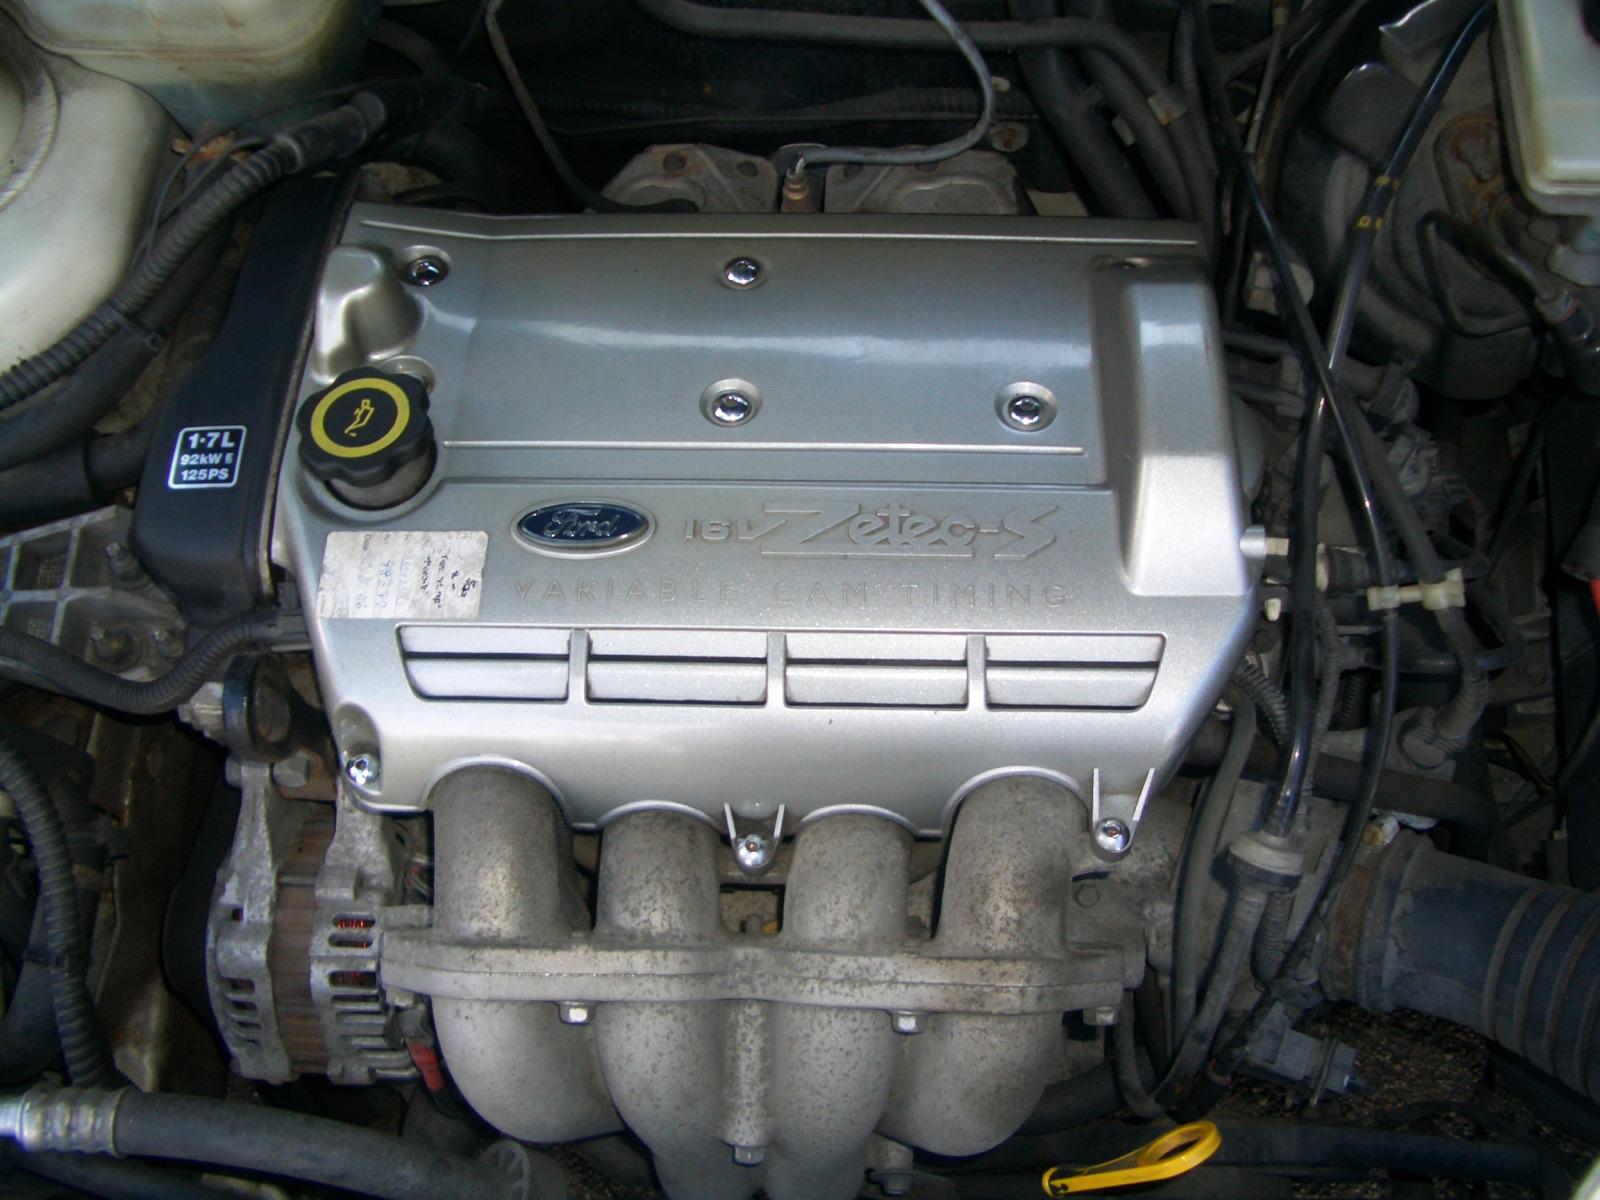 1999 pontiac grand prix engine diagram 2004 pontiac grand prix radiator diagram wirdig belt diagram on 2004 grand prix intake manifold wiring